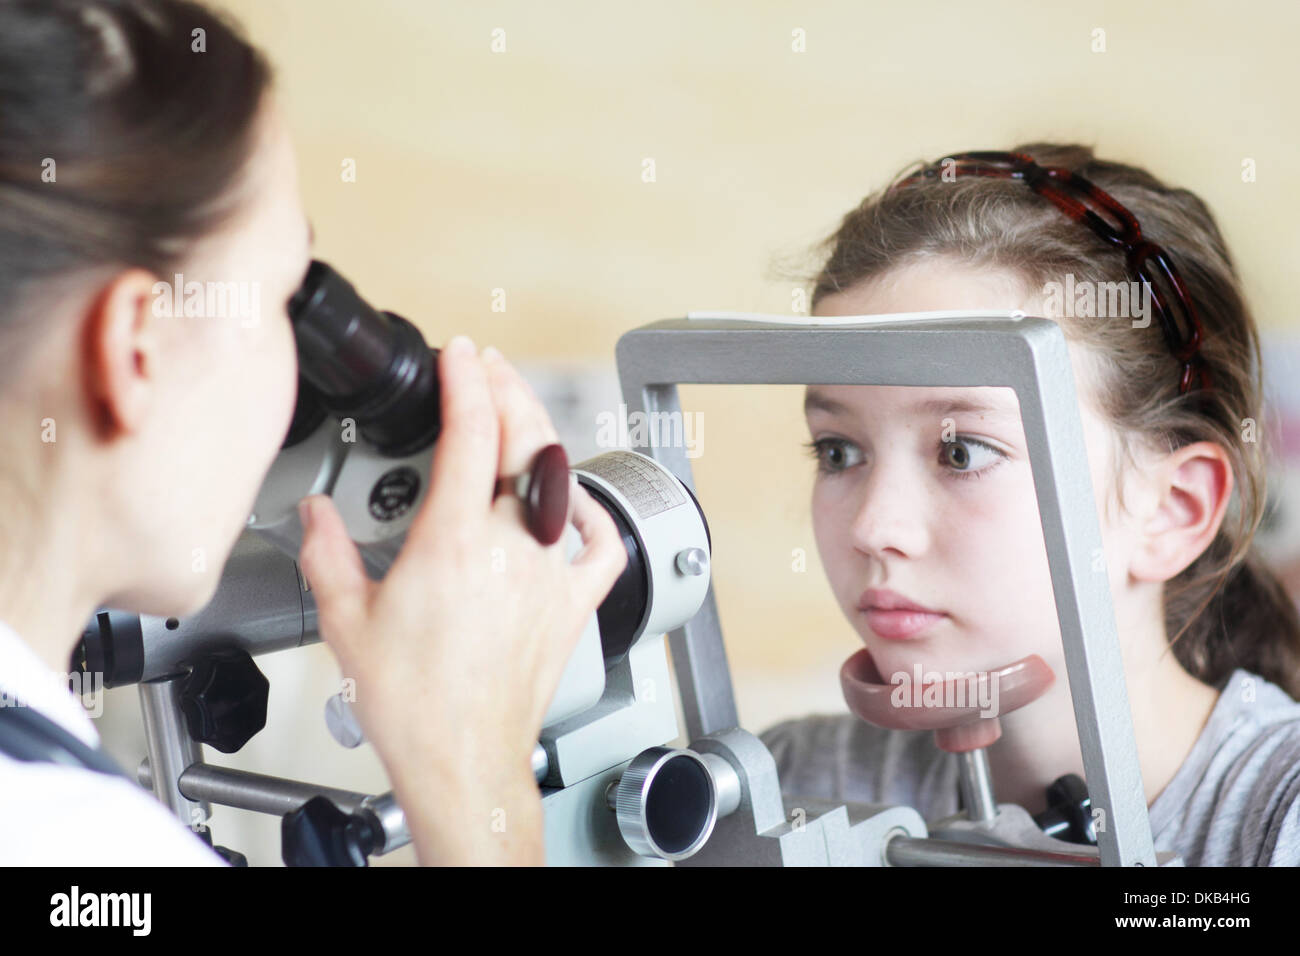 Optometrist examining girl's eyes - Stock Image